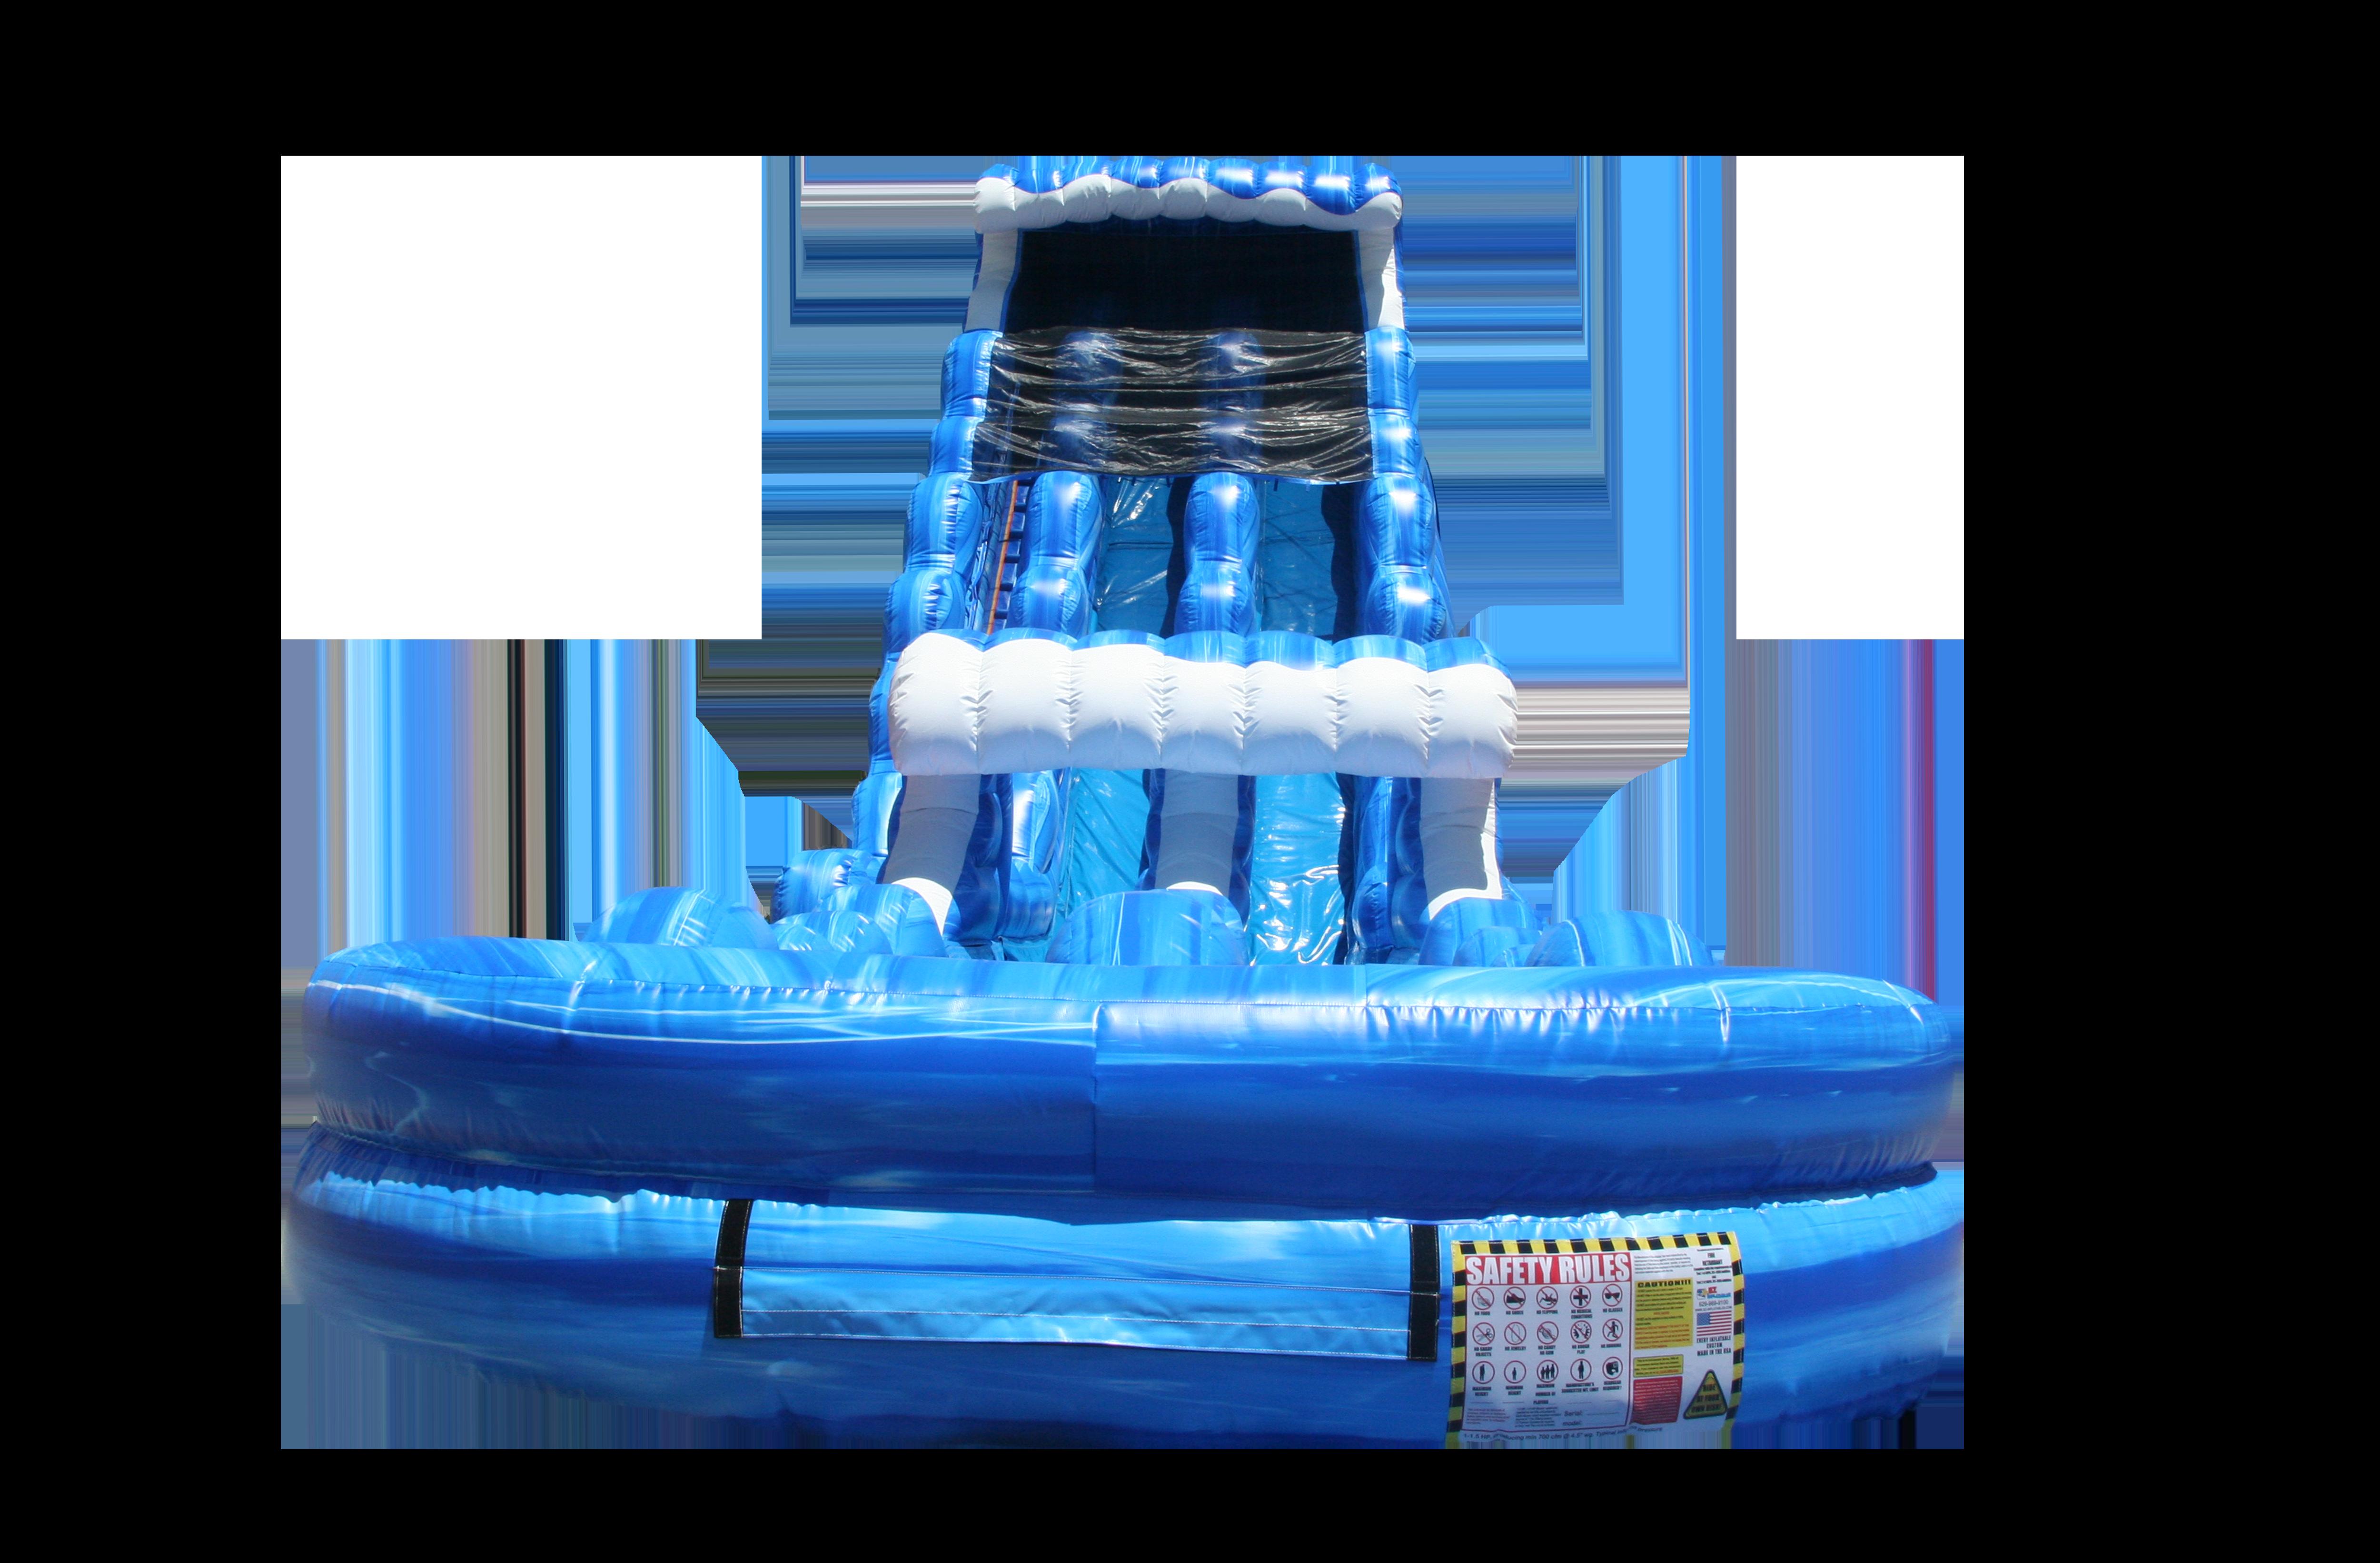 WS213-27 Ft Tsunami + Slip and Slide-HR-01